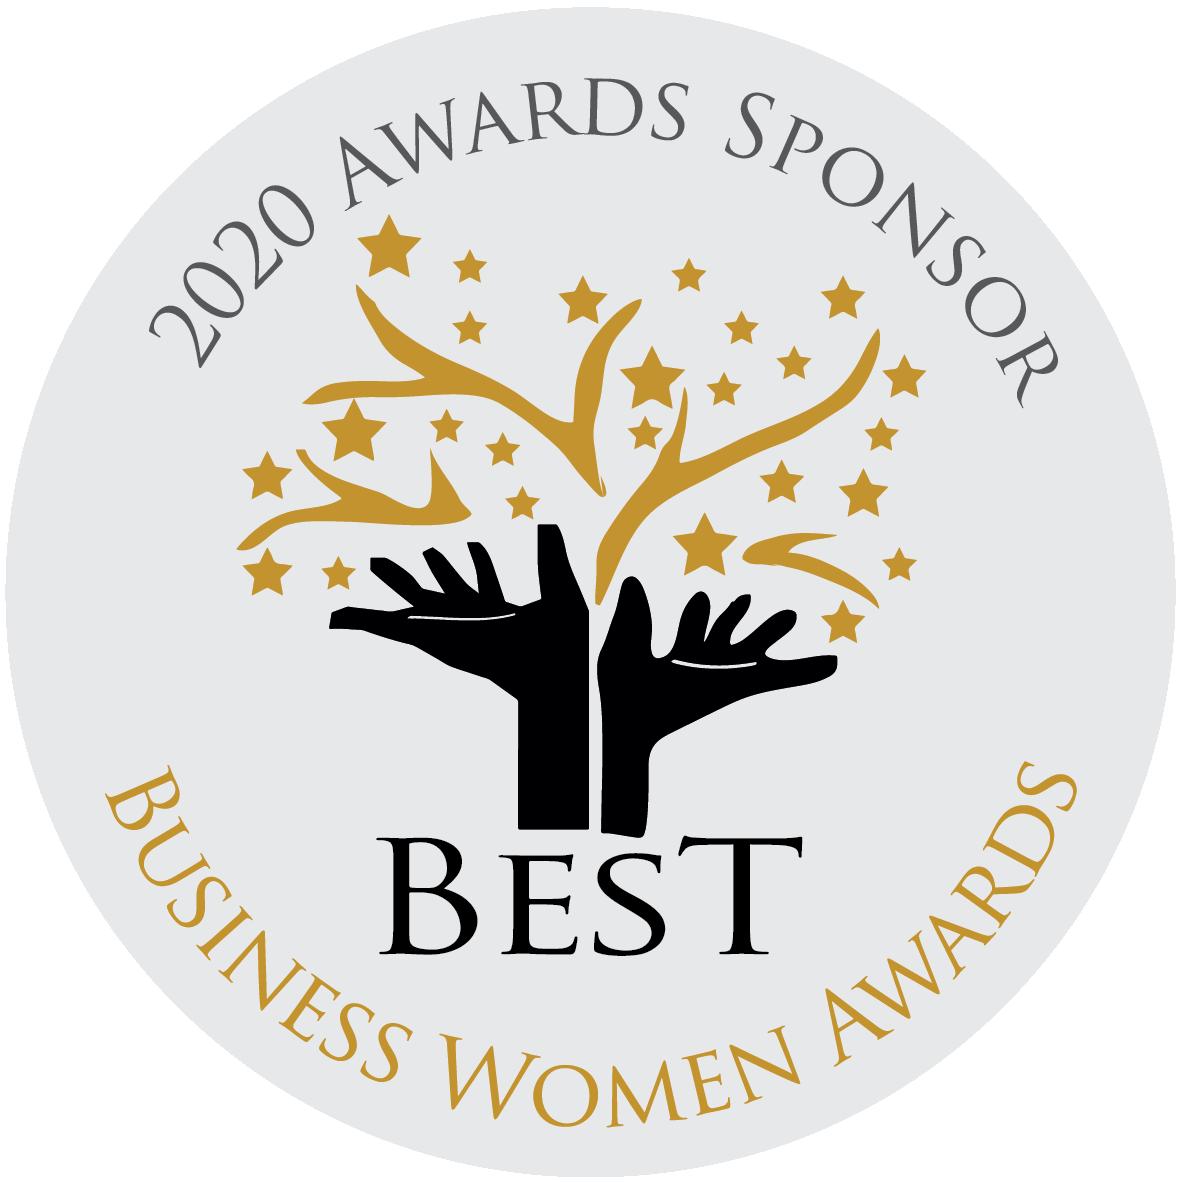 Proud Sponsors of Best Business Women Awards 2020